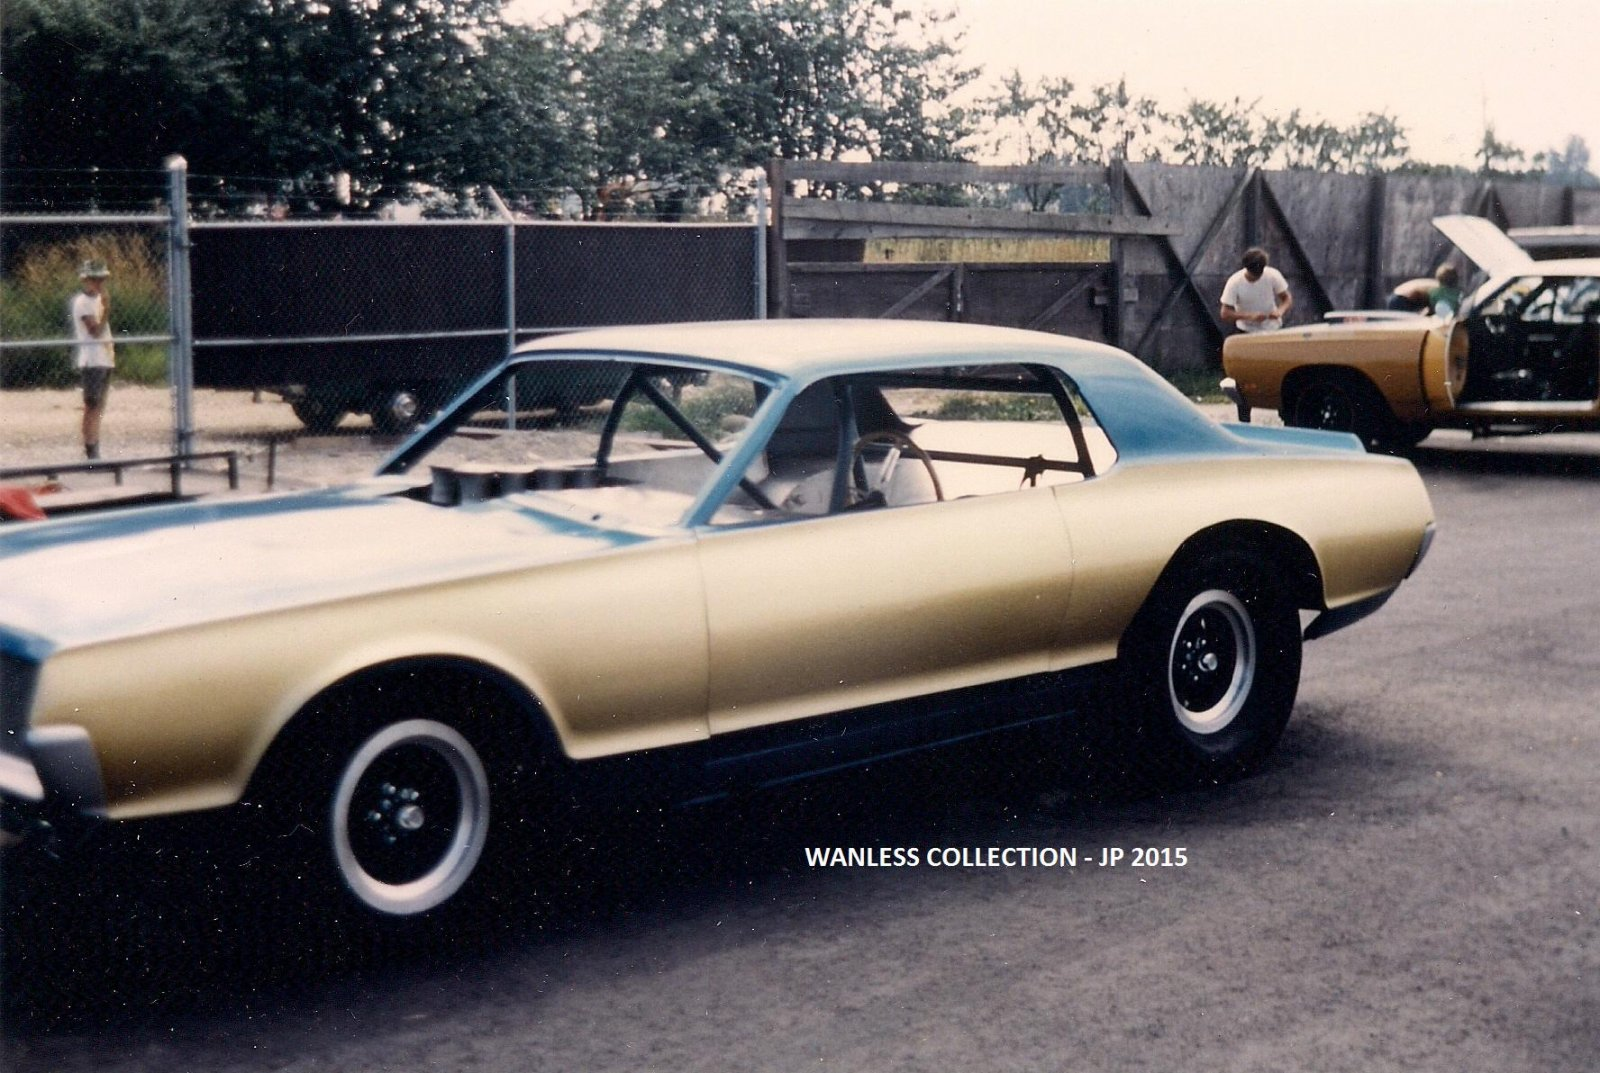 Wanless 68 Cougar 020WEB.jpg